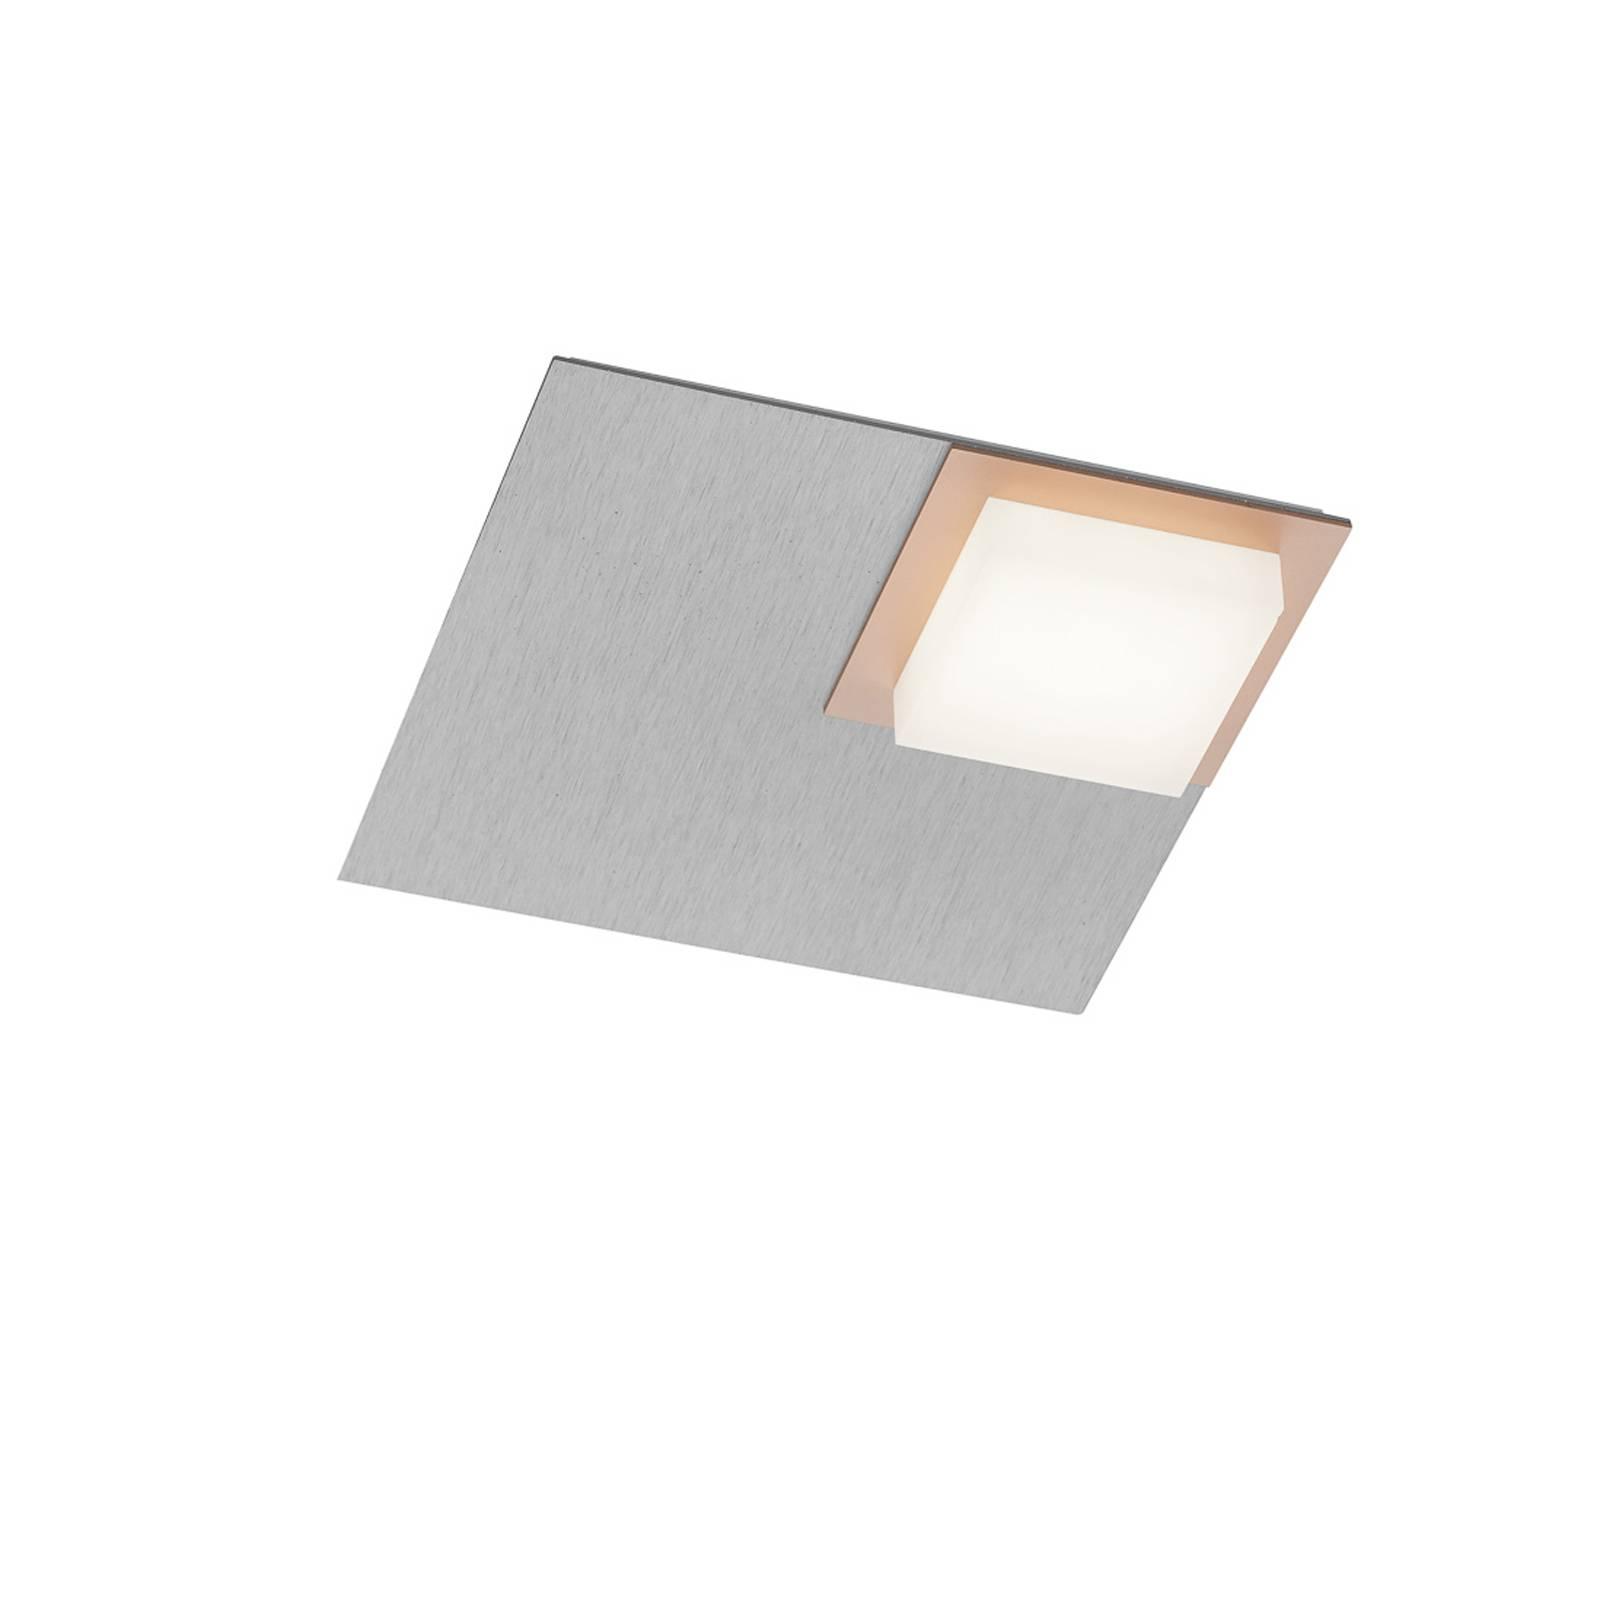 BANKAMP Quadro LED-Deckenleuchte 8W silber